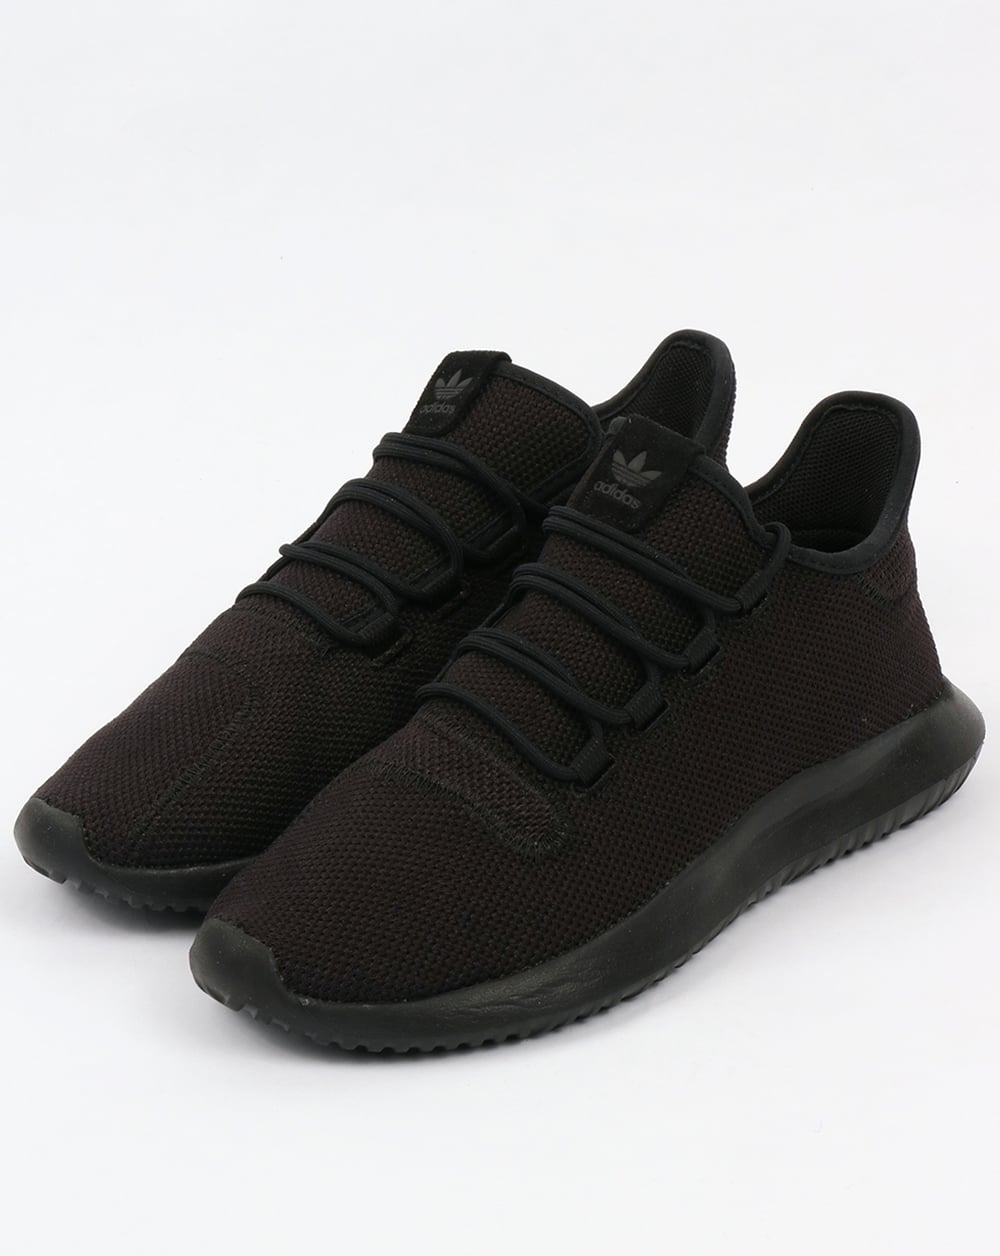 Adidas Tubular Shadow Trainers Black